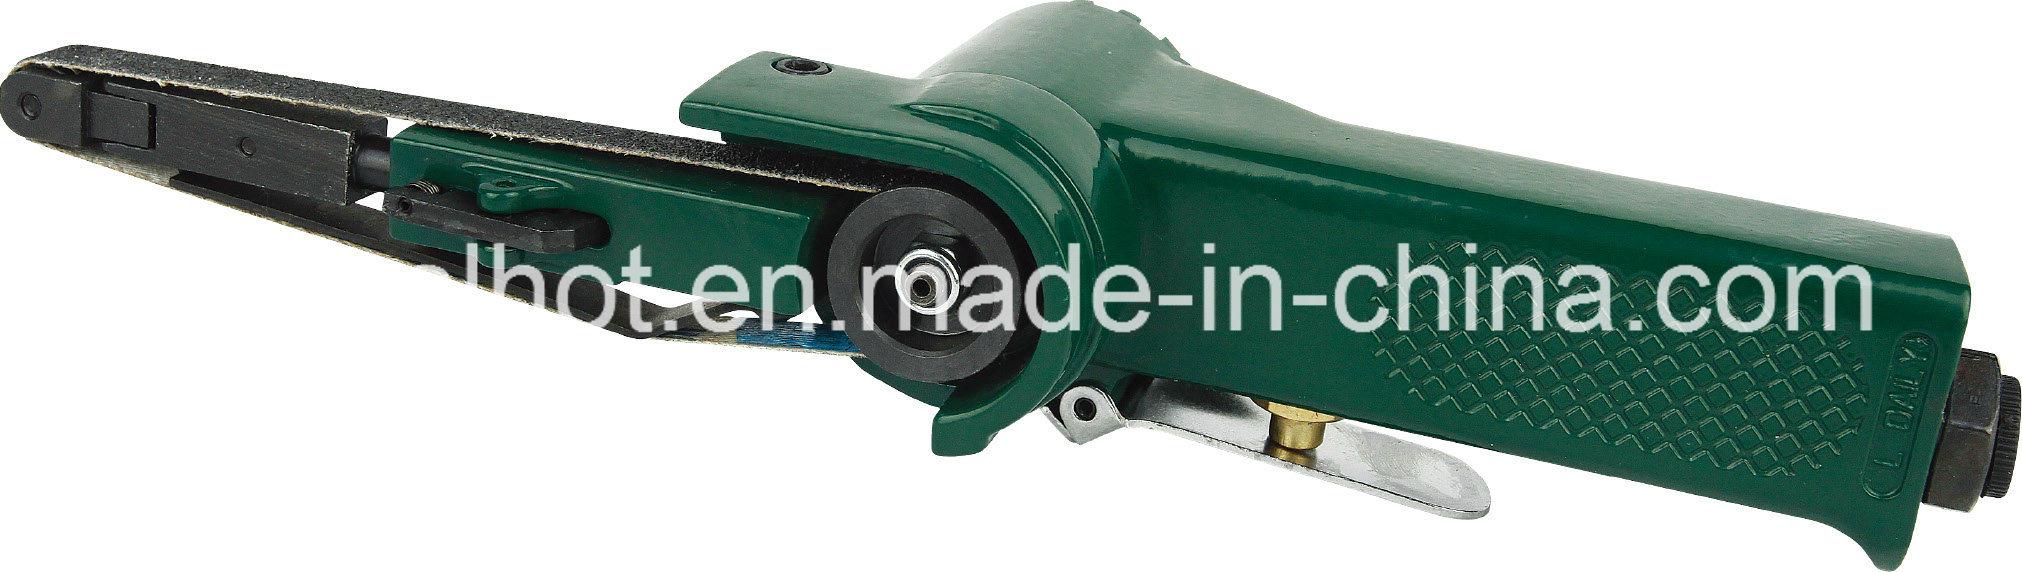 Air Belt Sander (Green)